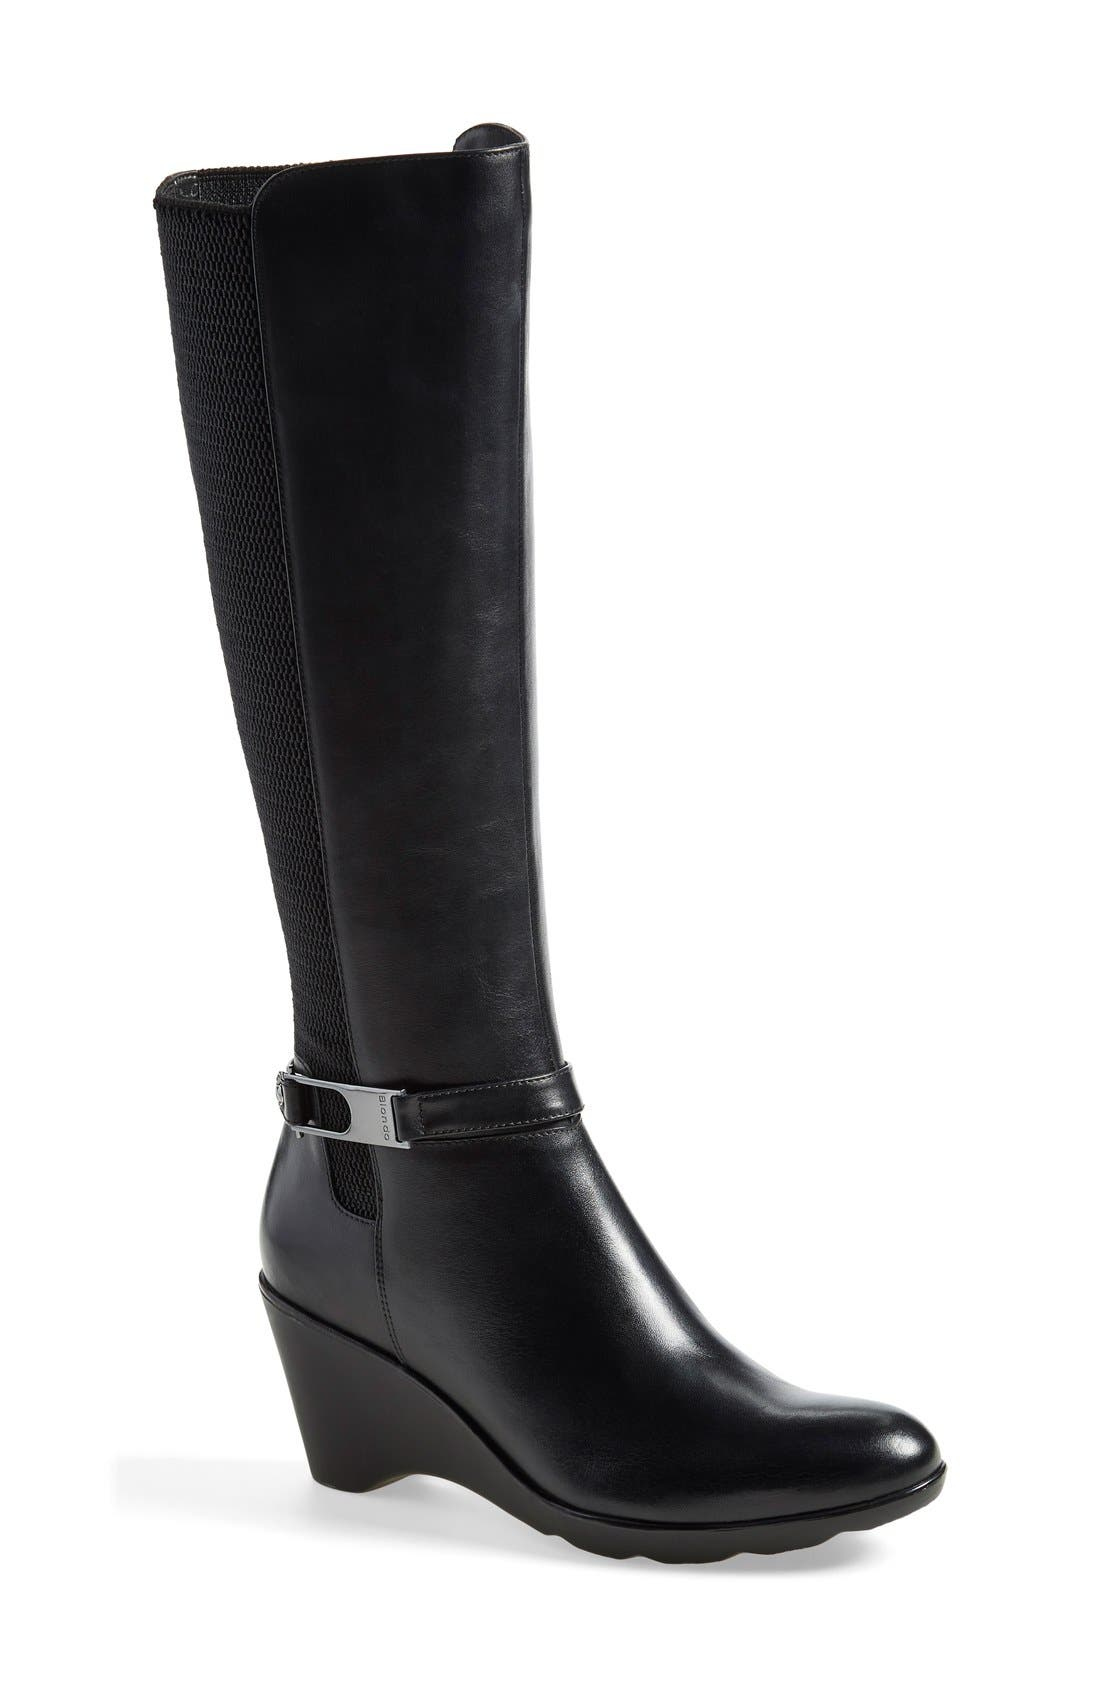 Alternate Image 1 Selected - Blondo 'Laina' Waterproof Boot (Women) (Nordstrom Exclusive)